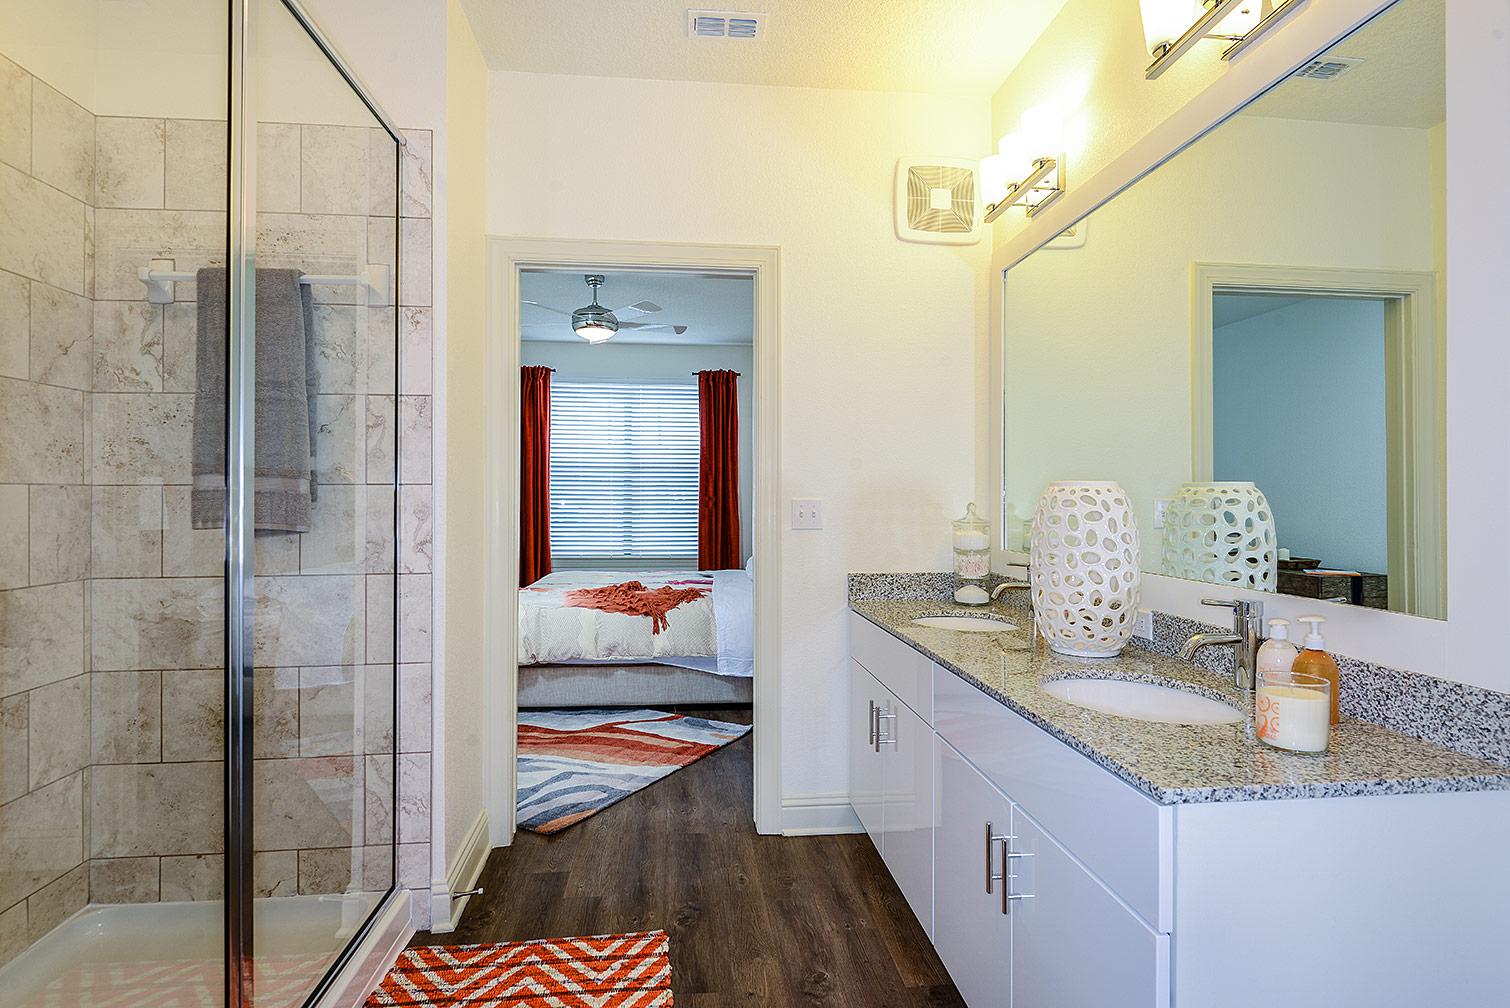 Greystar--EOS-Apartments-8517.jpg